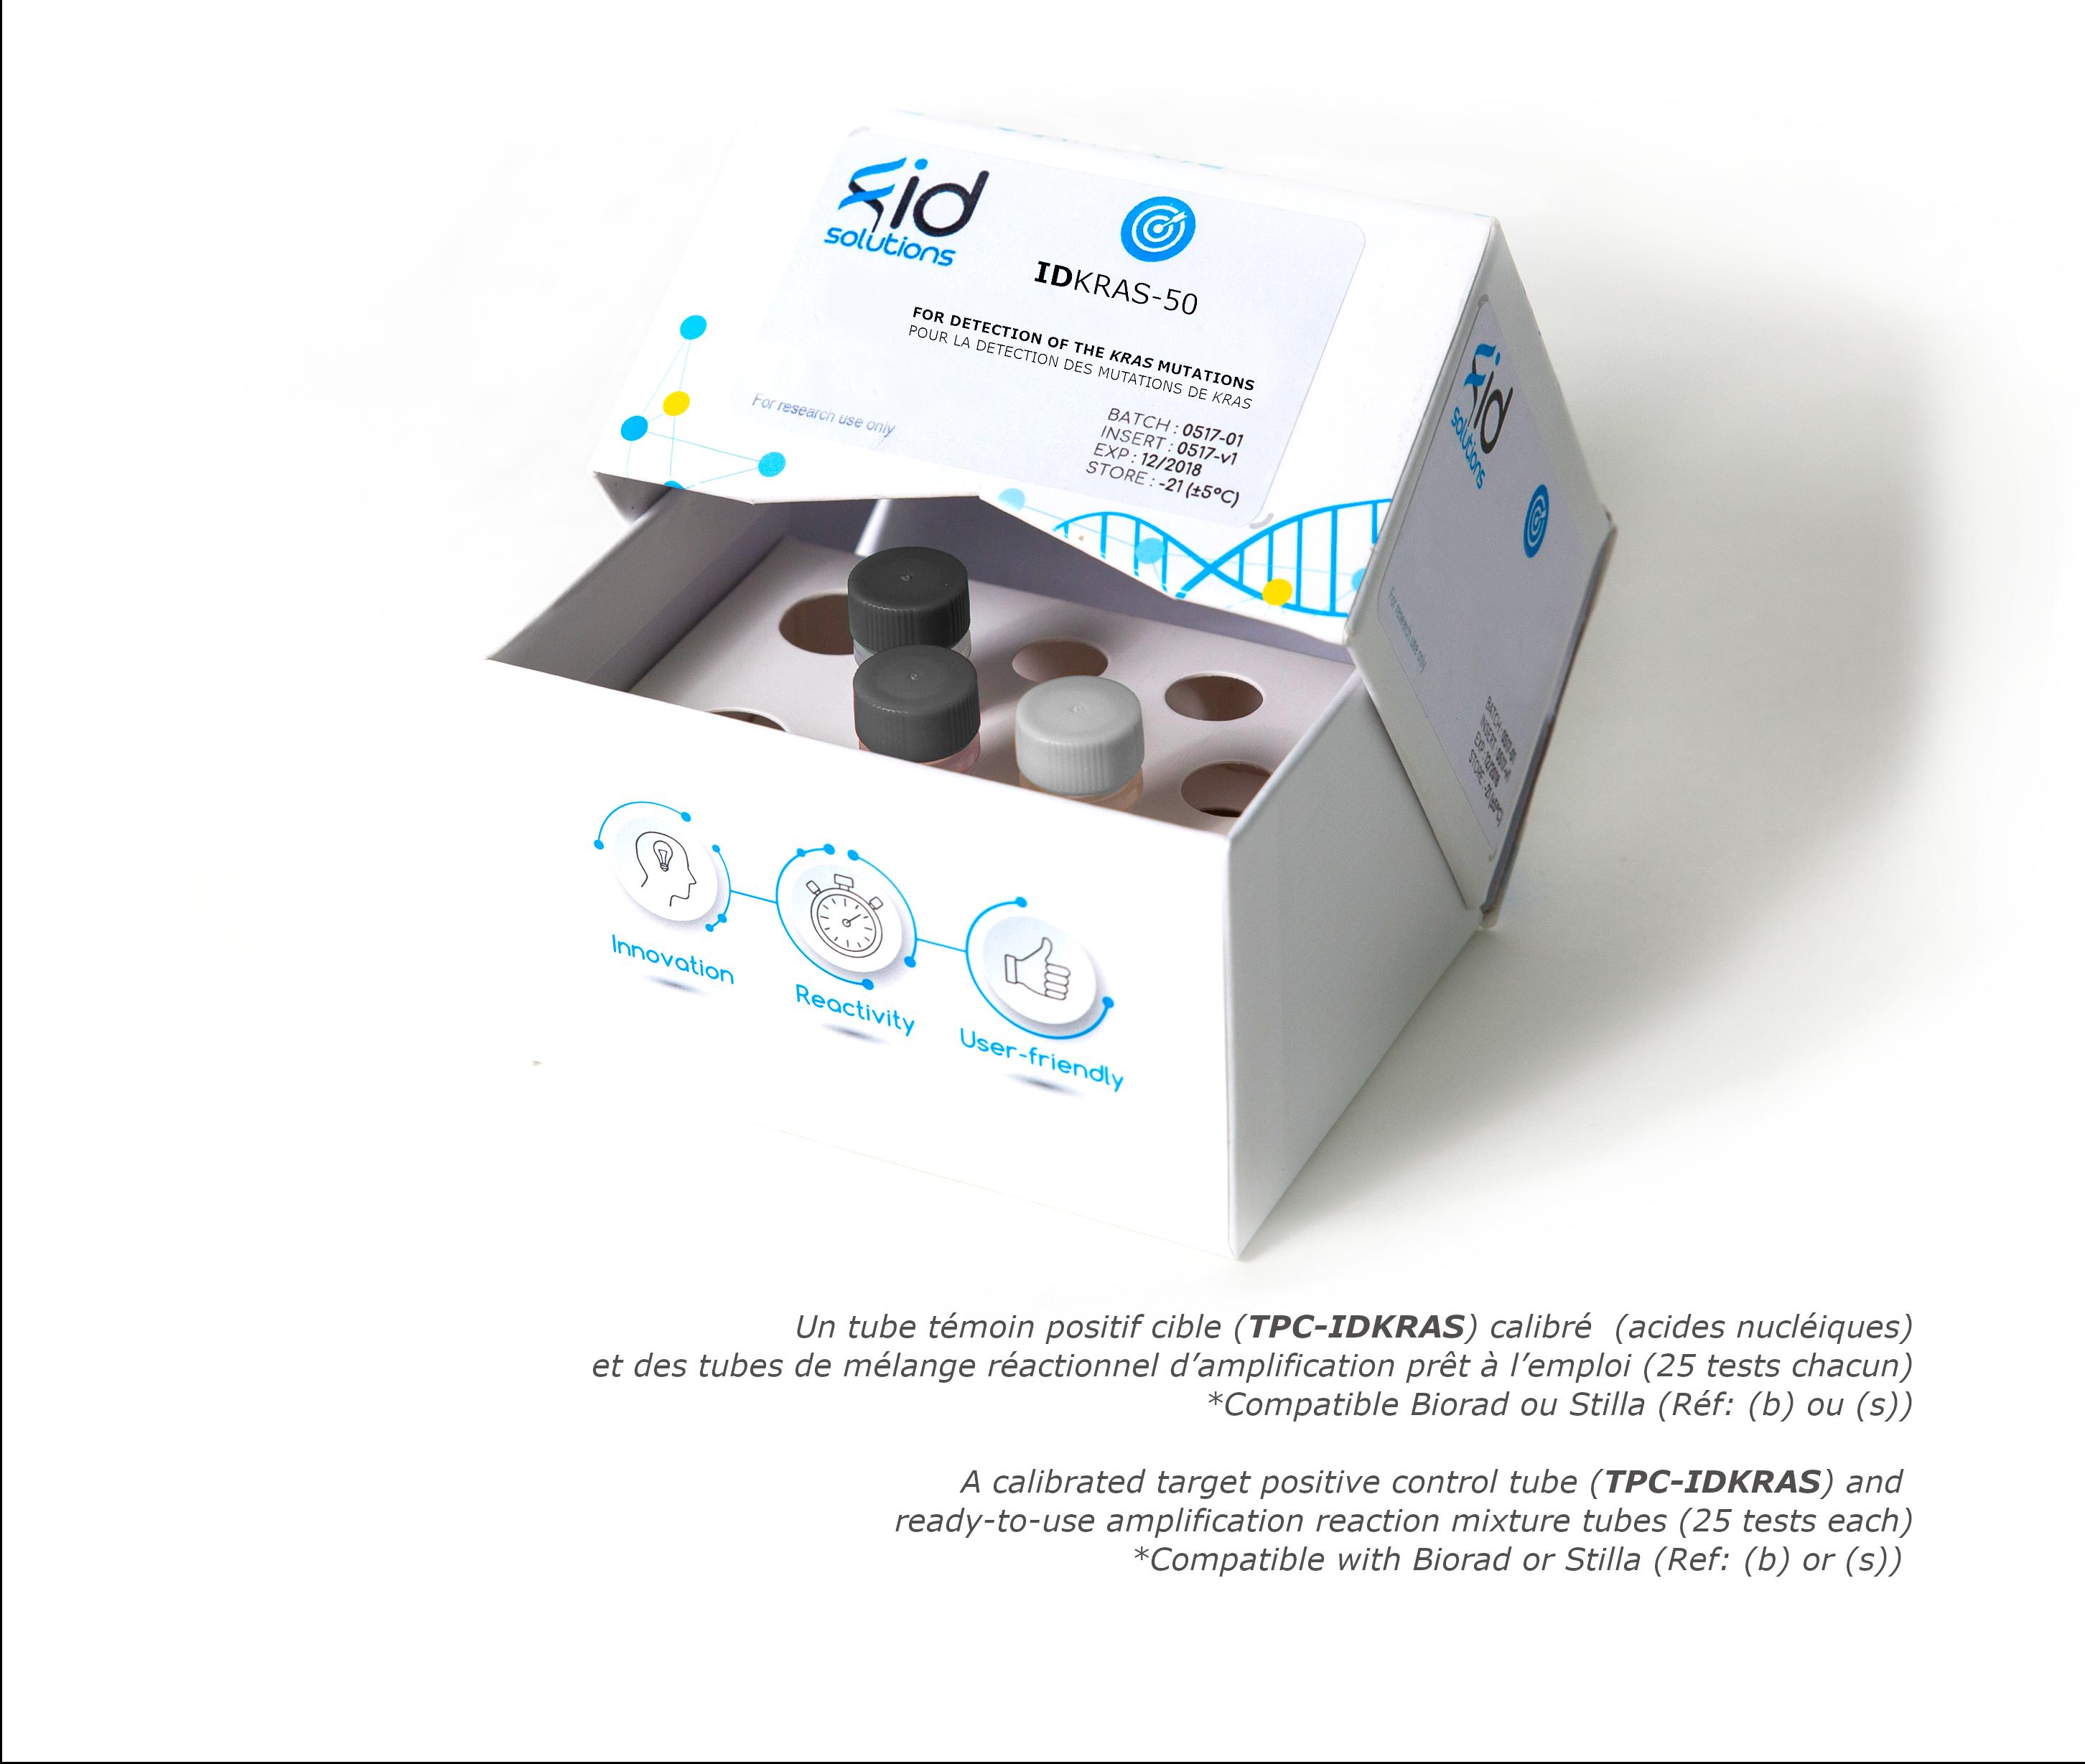 IDKRAS- Tumor DNA or circulating DNA or ctDNA KRAS Mutation Detection Kit based on Digital PCR